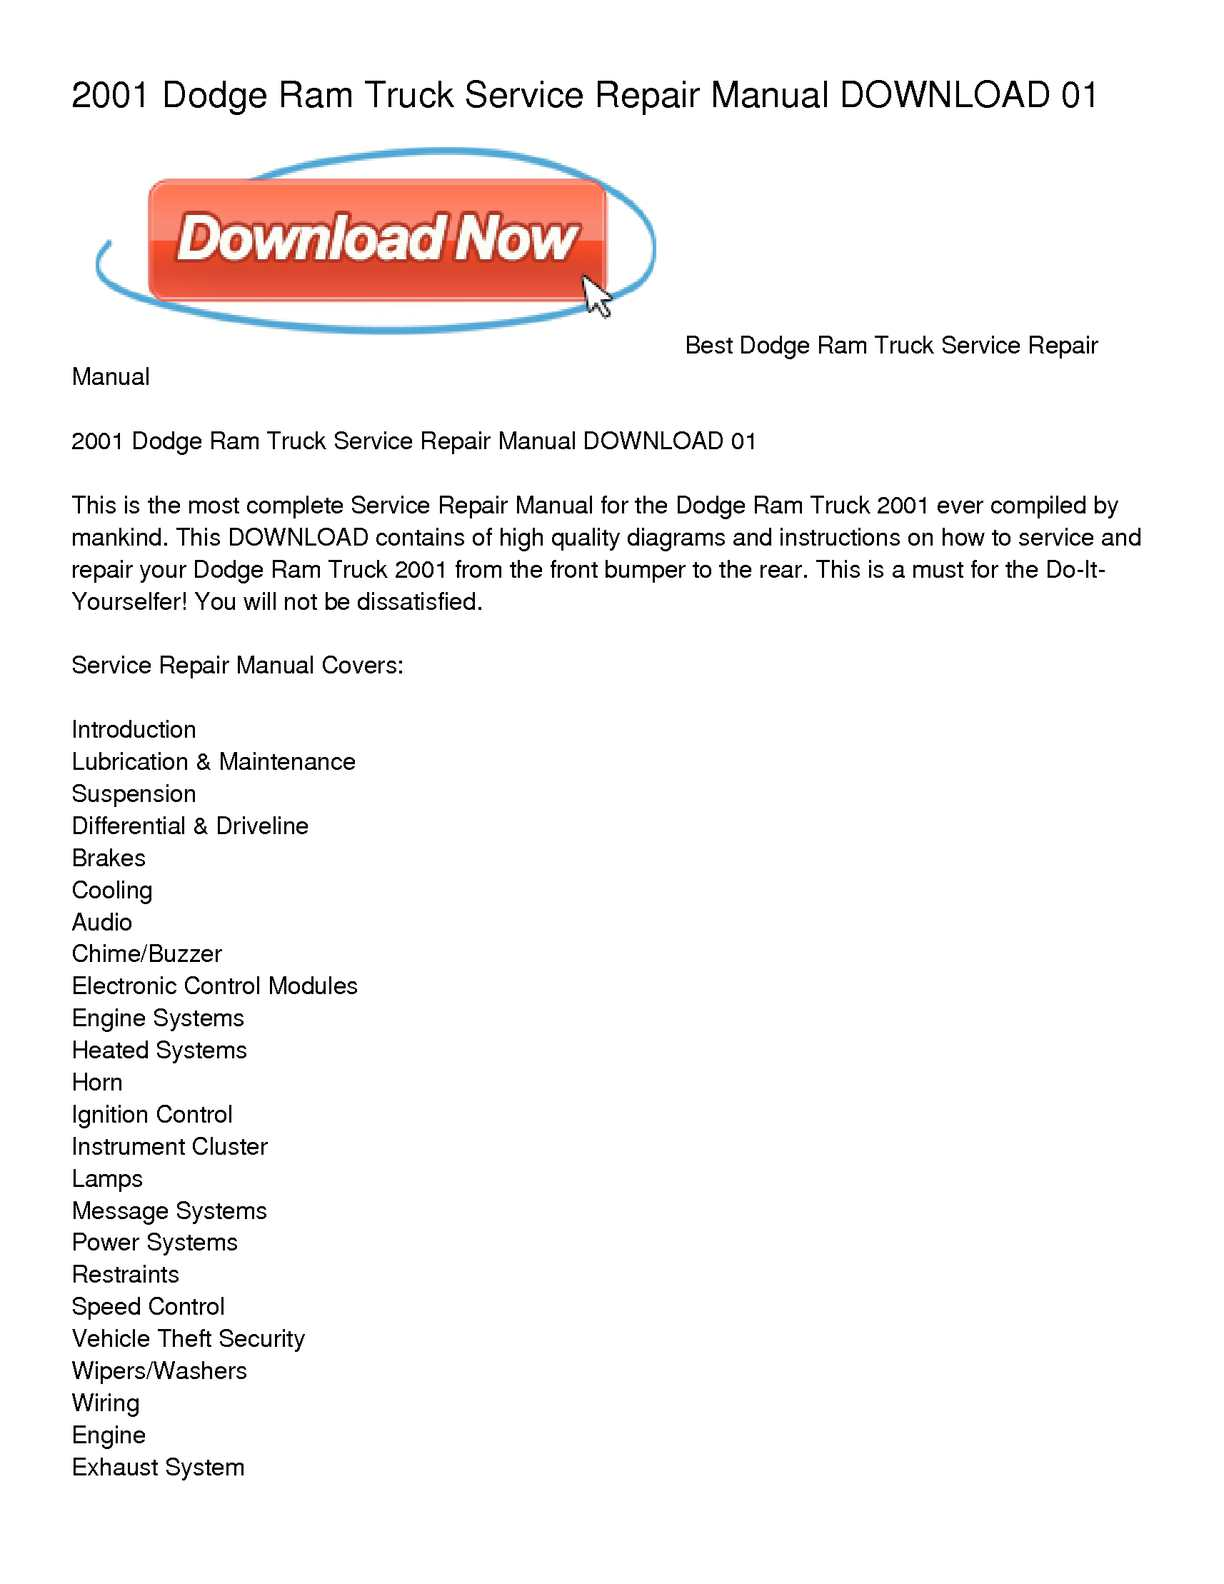 Calaméo - 2001 Dodge Ram Truck Service Repair Manual DOWNLOAD 01